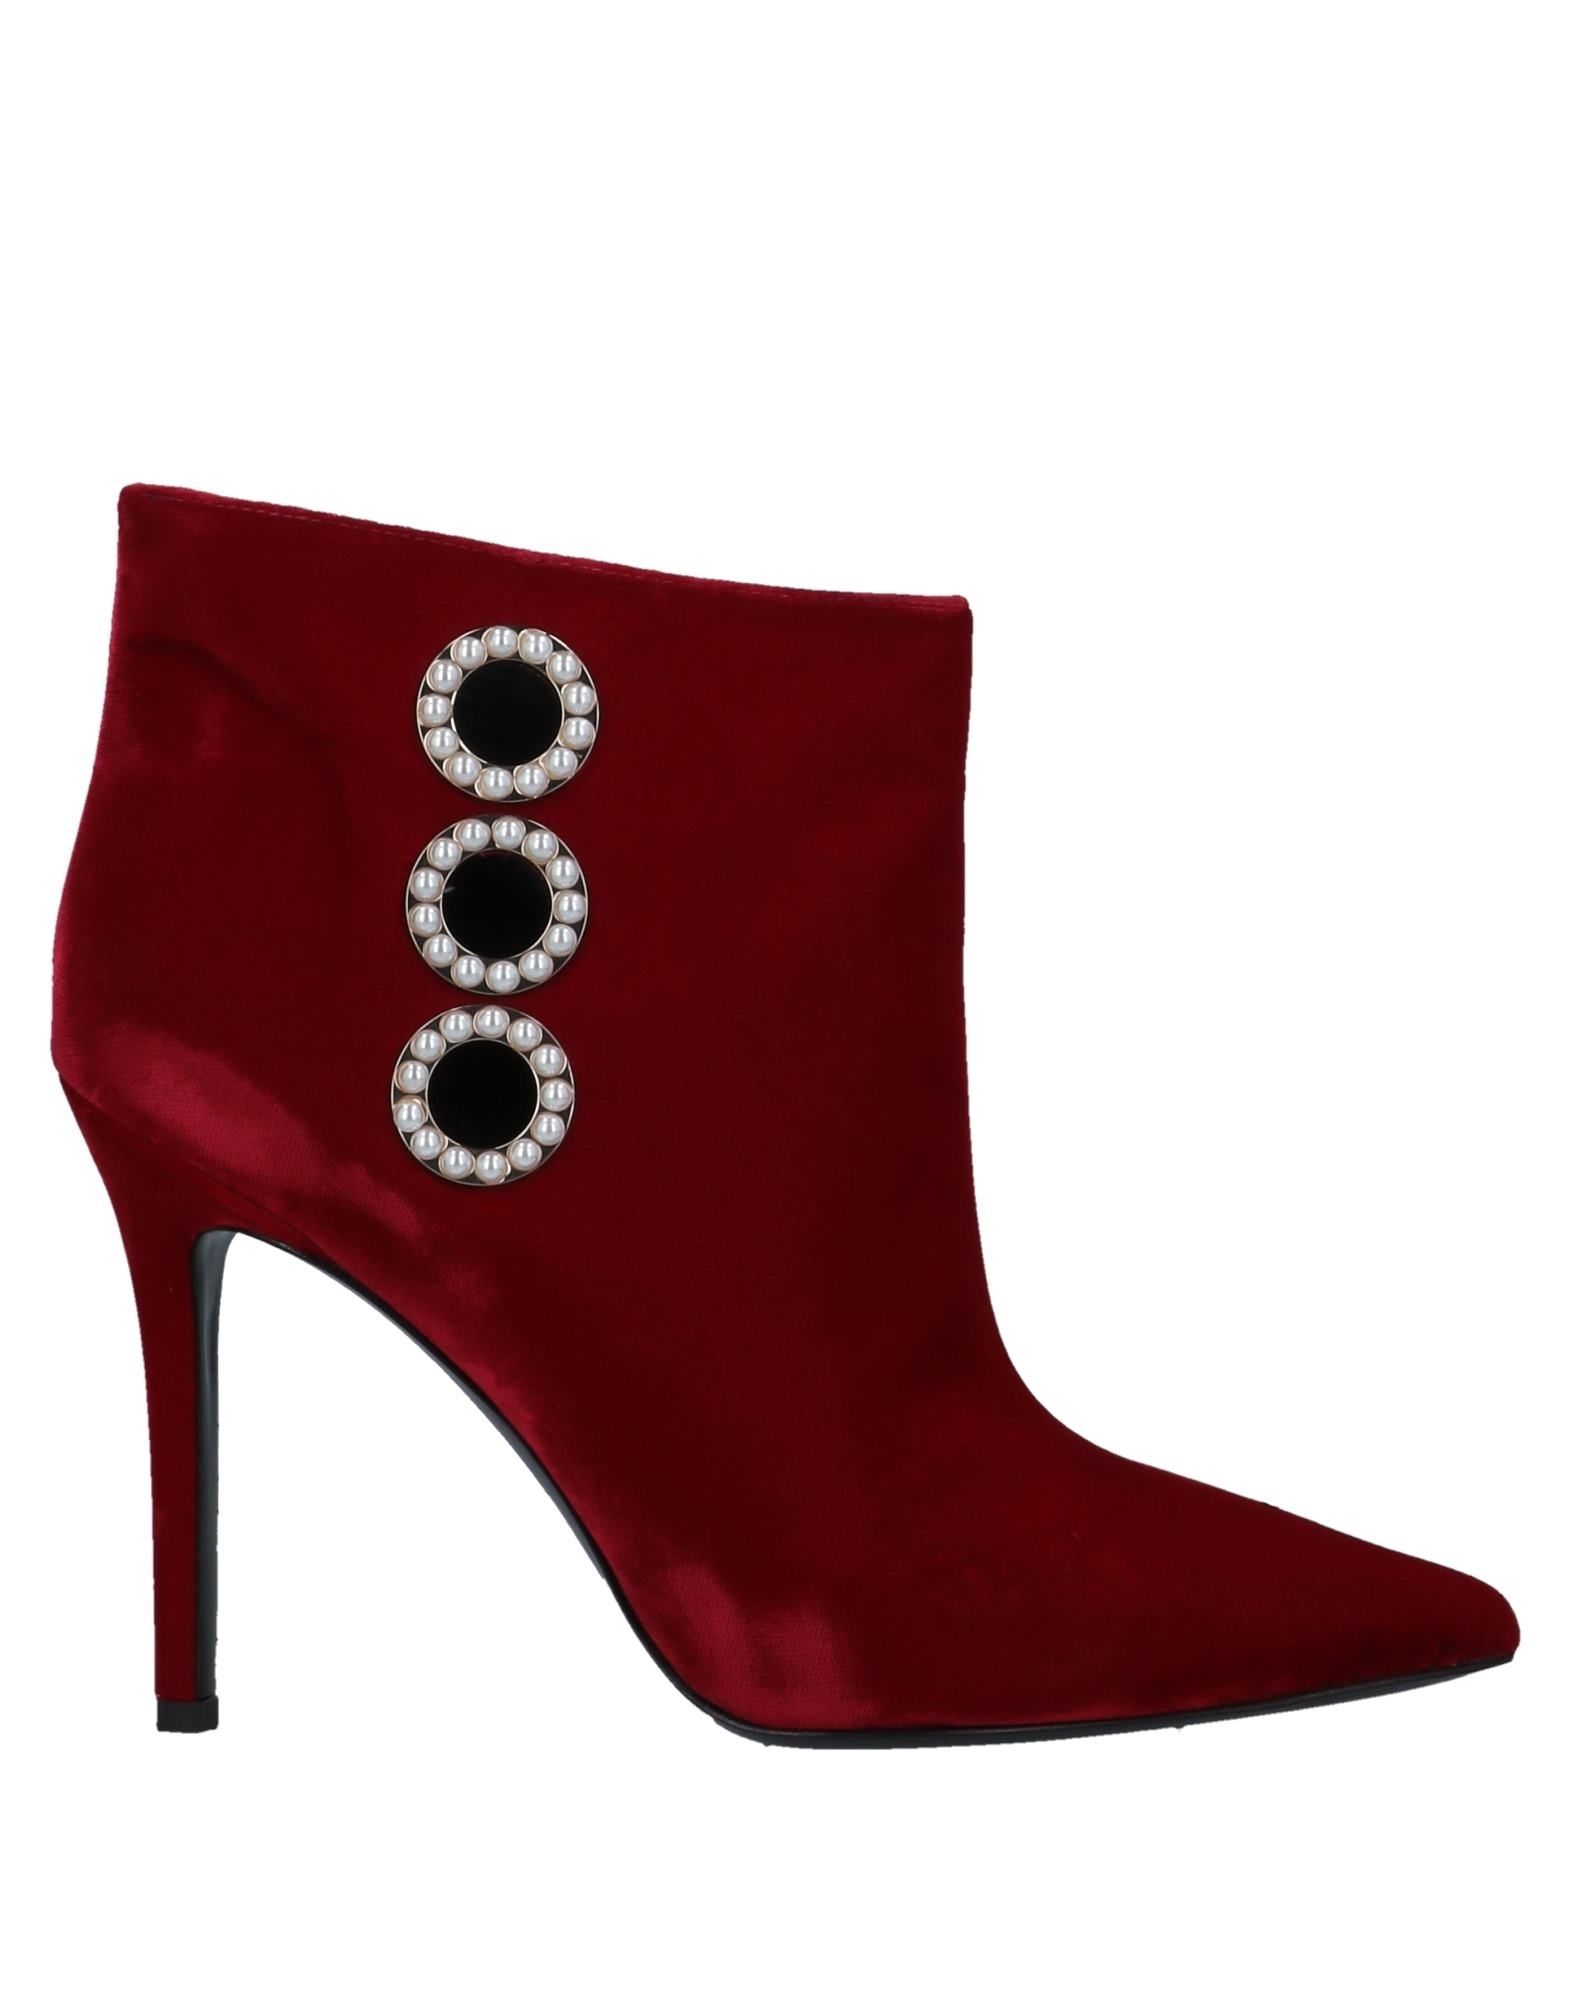 Stella Luna Stiefelette Damen  11544104PK Beliebte Schuhe